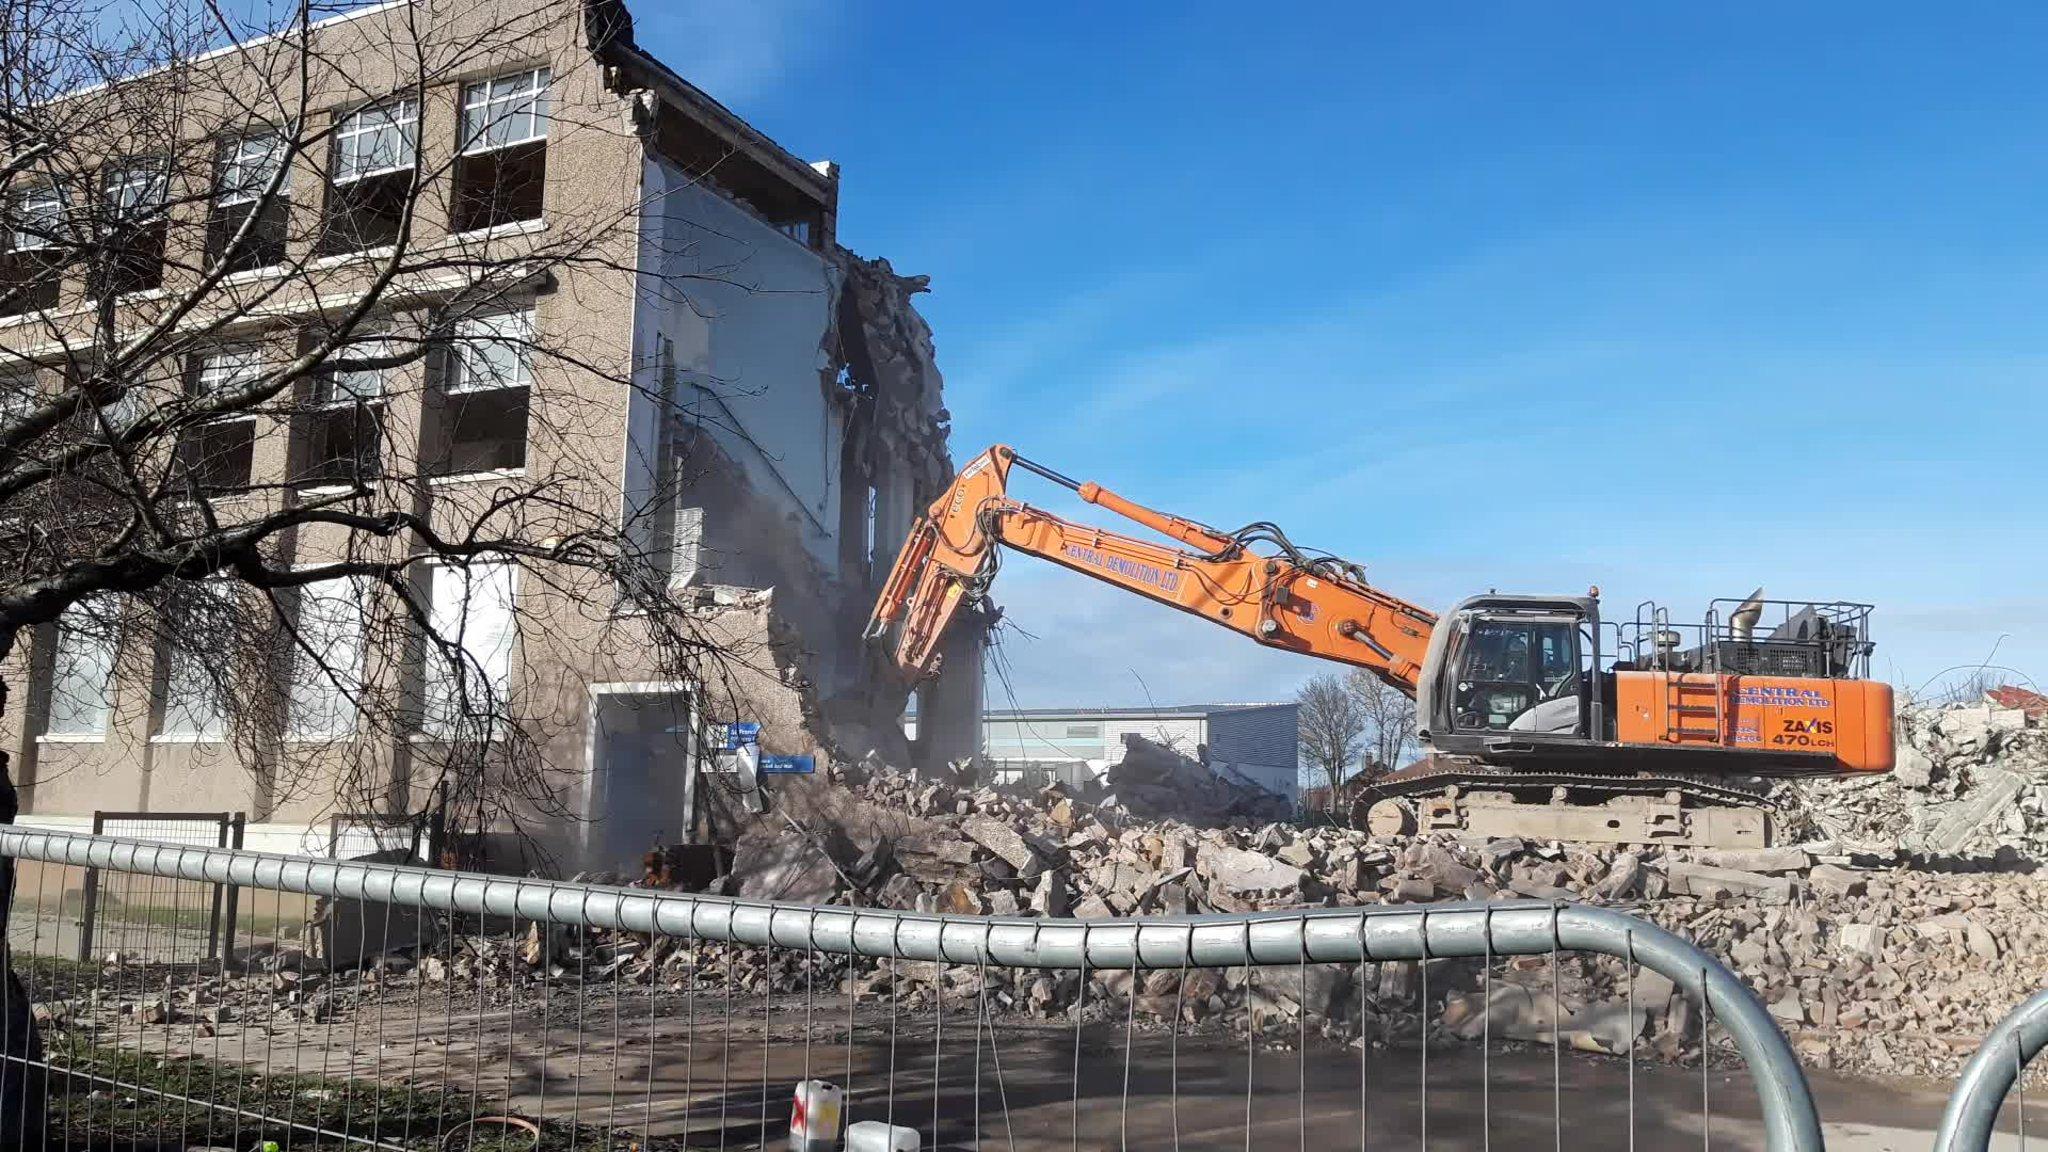 The school was demolished last year